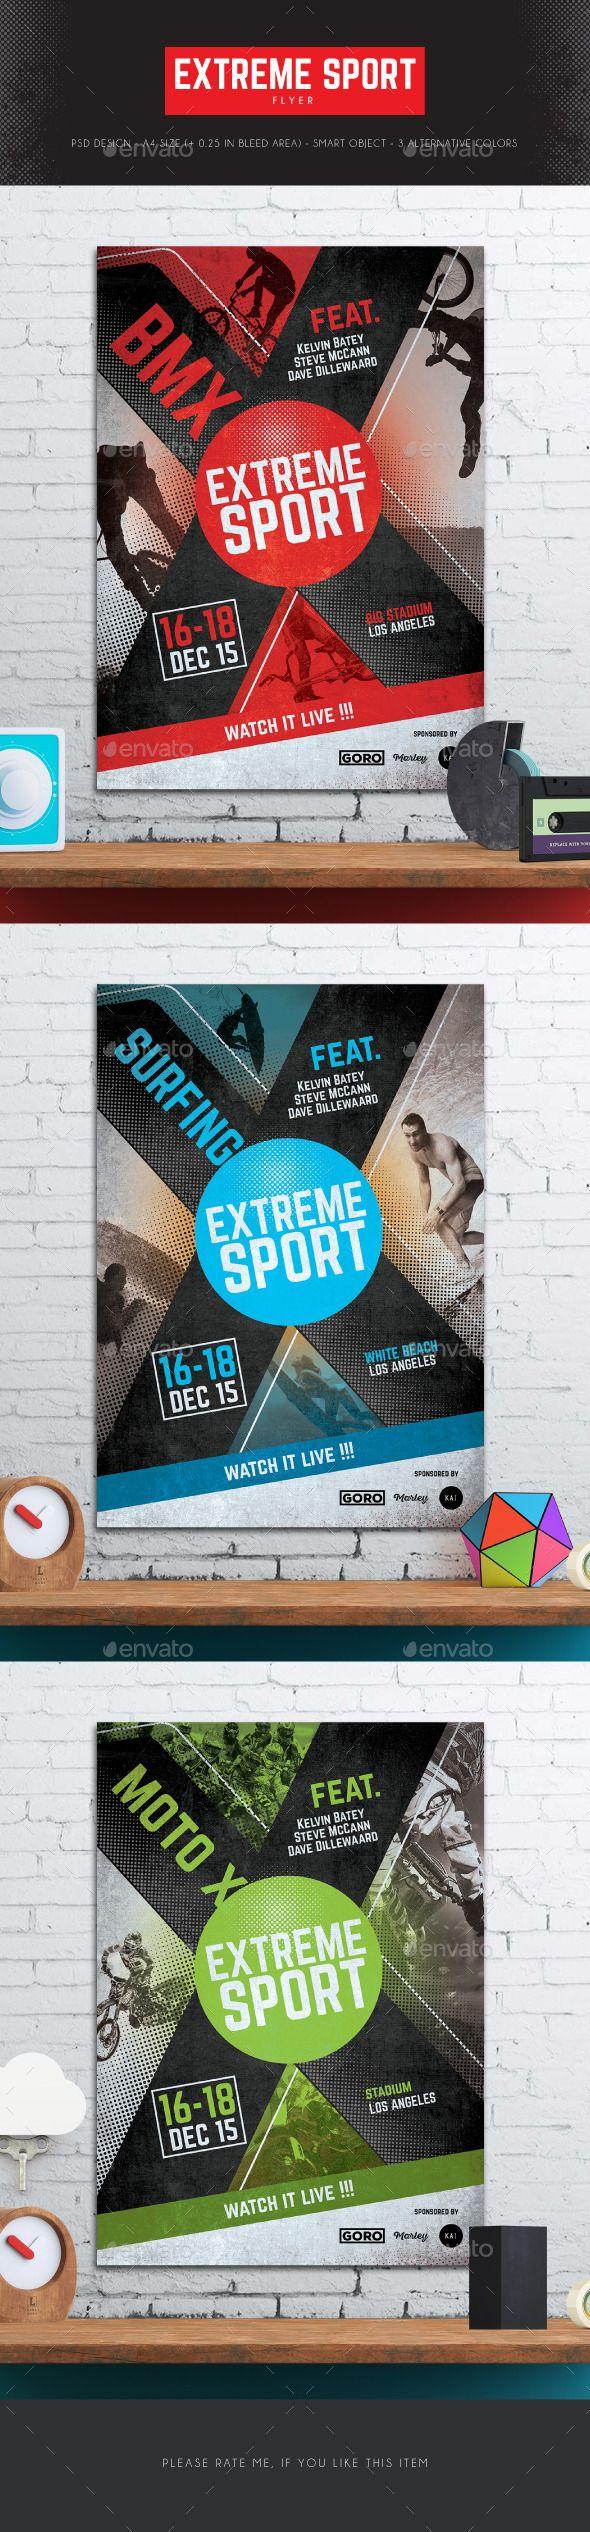 Extreme Sport Flyer Template PSD #design Download: http://graphicriver.net/item/extreme-sport-flyer/12866754?ref=ksioks